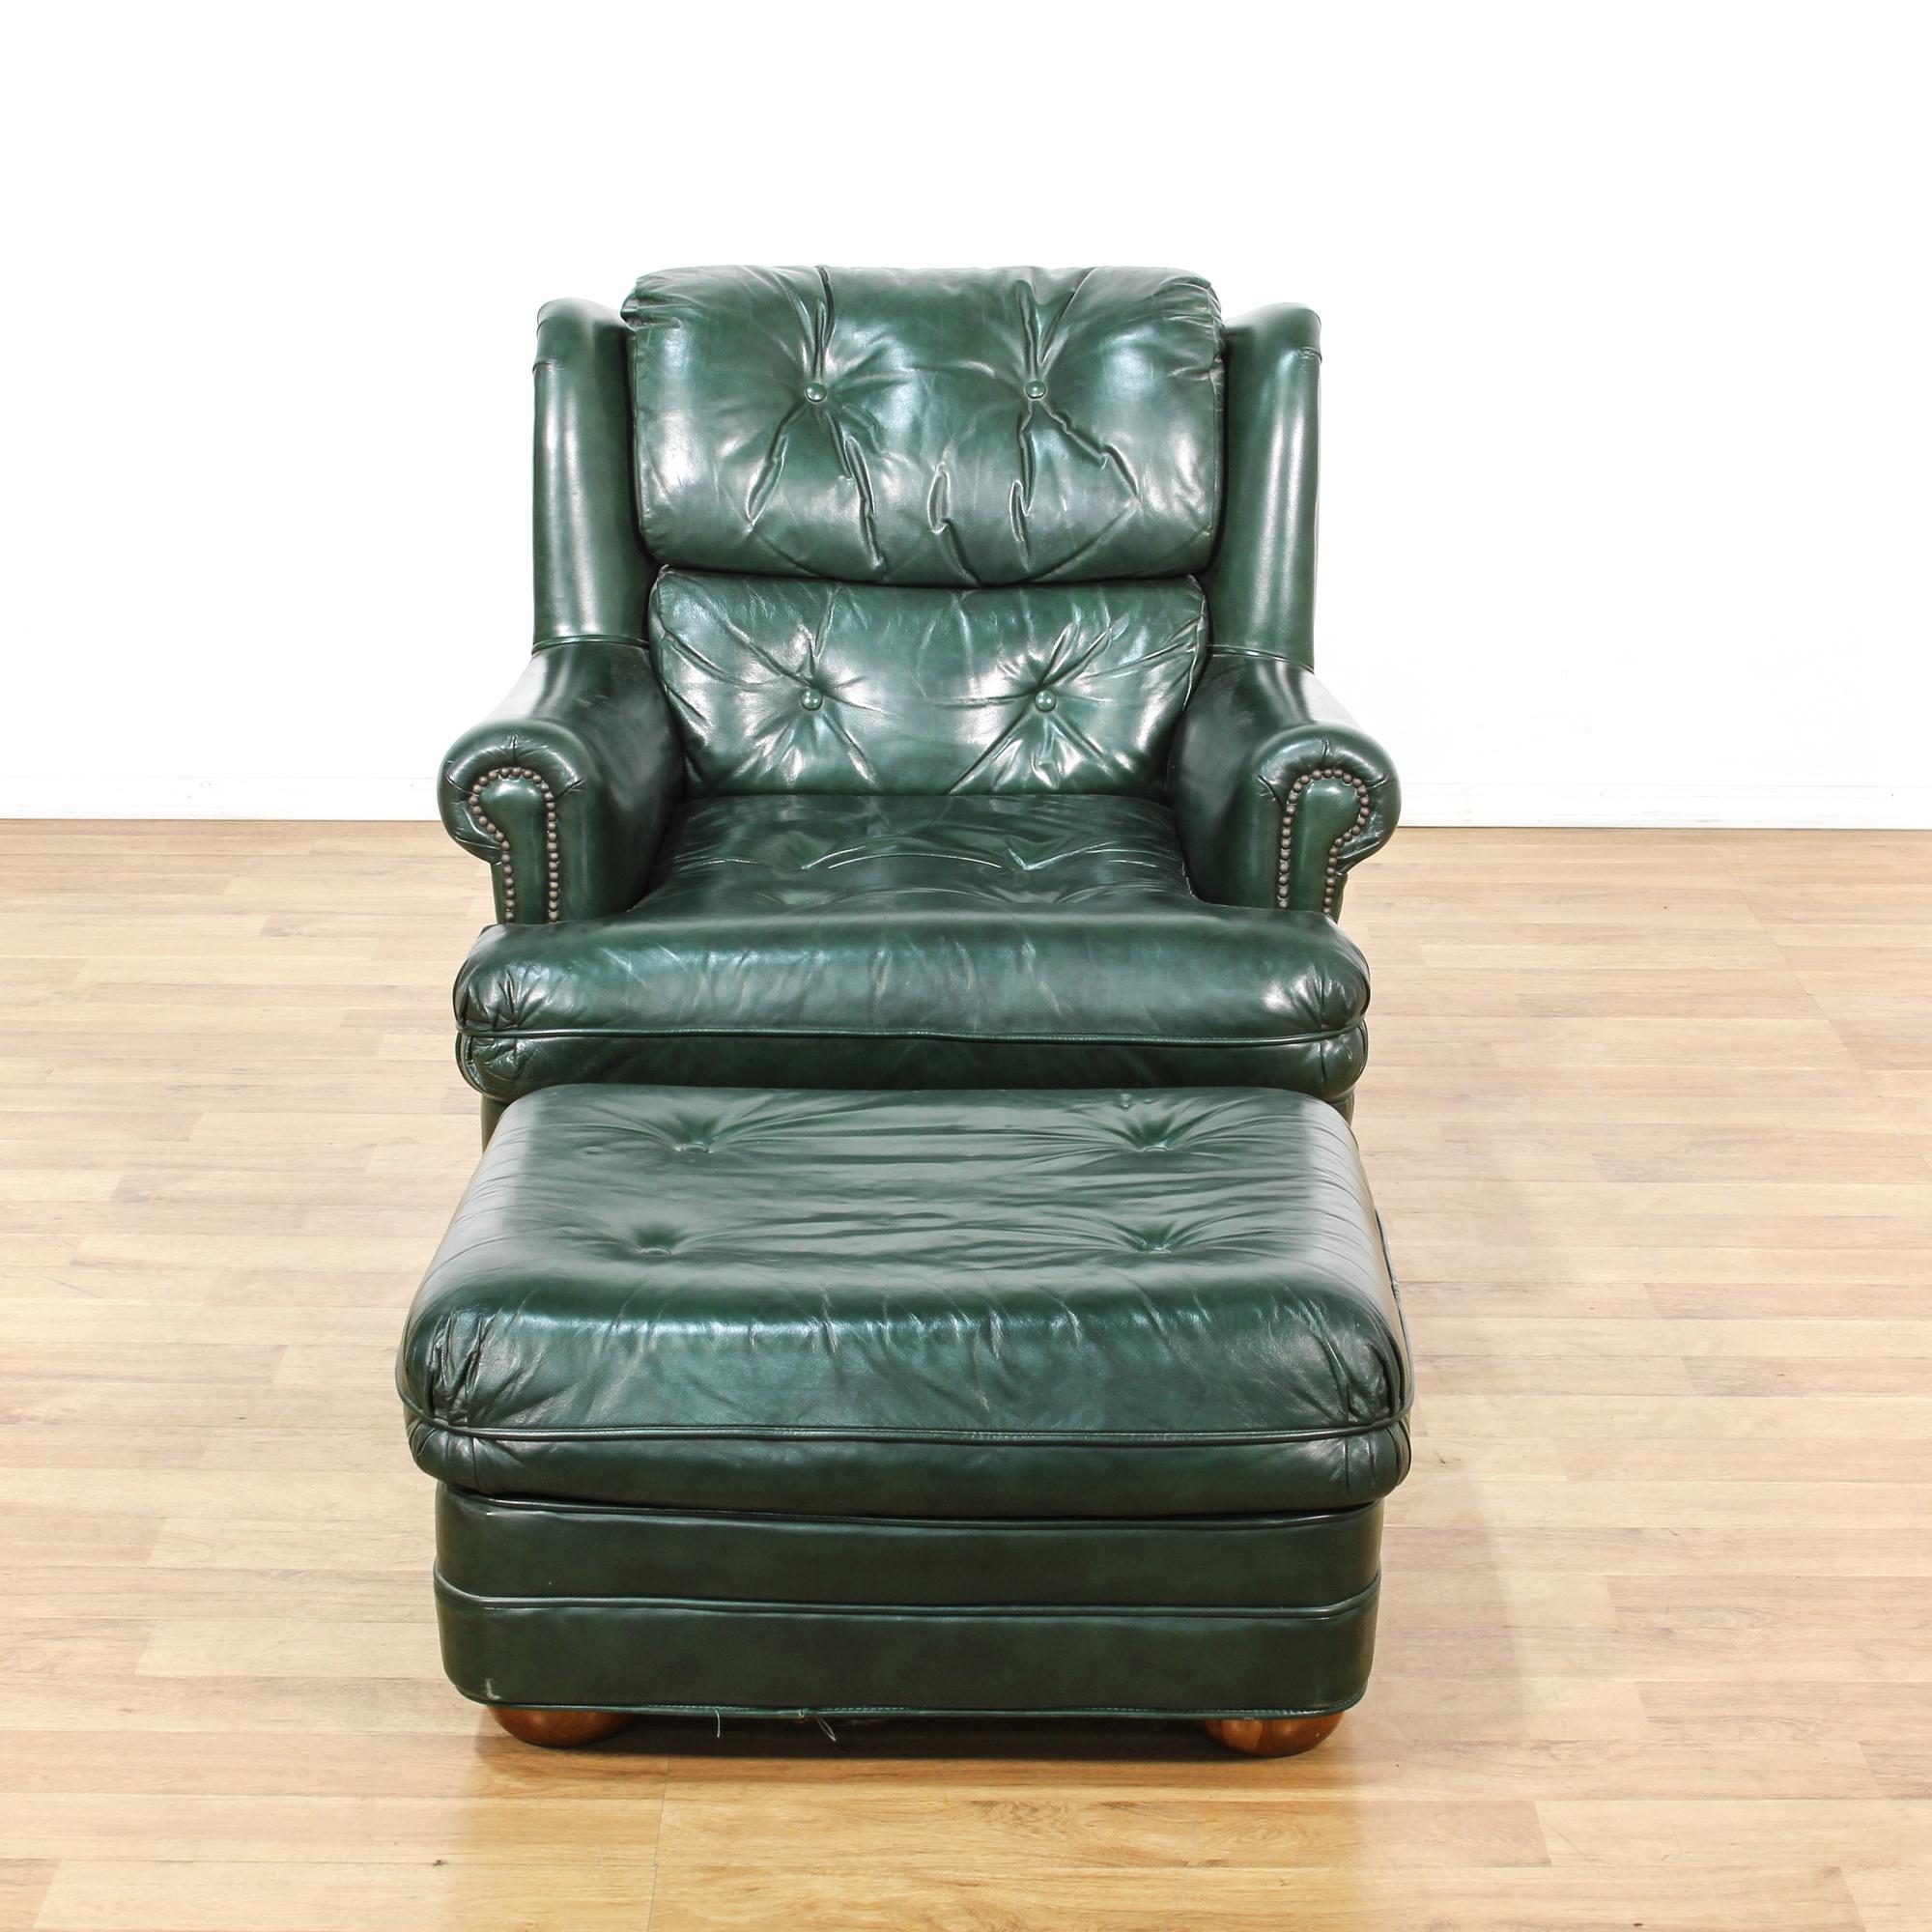 Dark Green Leather Upholstered Chair U0026 Ottoman | Loveseat Vintage Furniture  Los Angeles